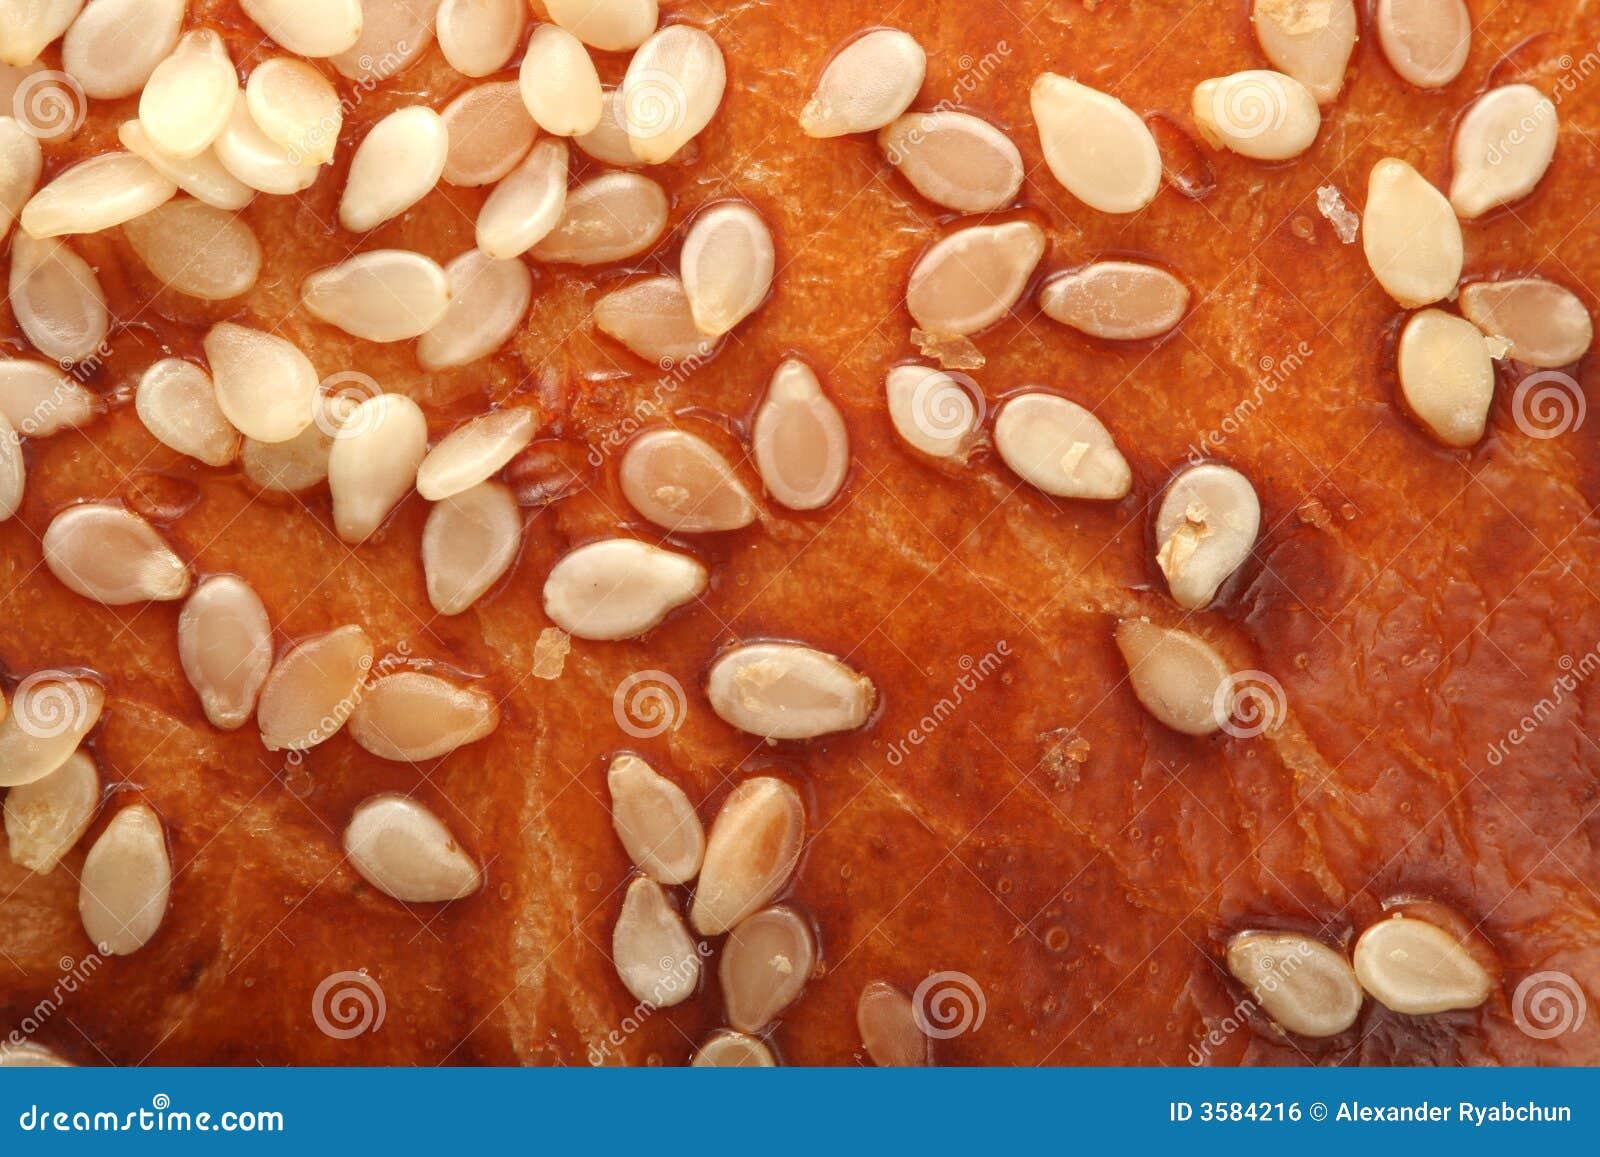 Gérmenes de sésamo en la corteza del pan